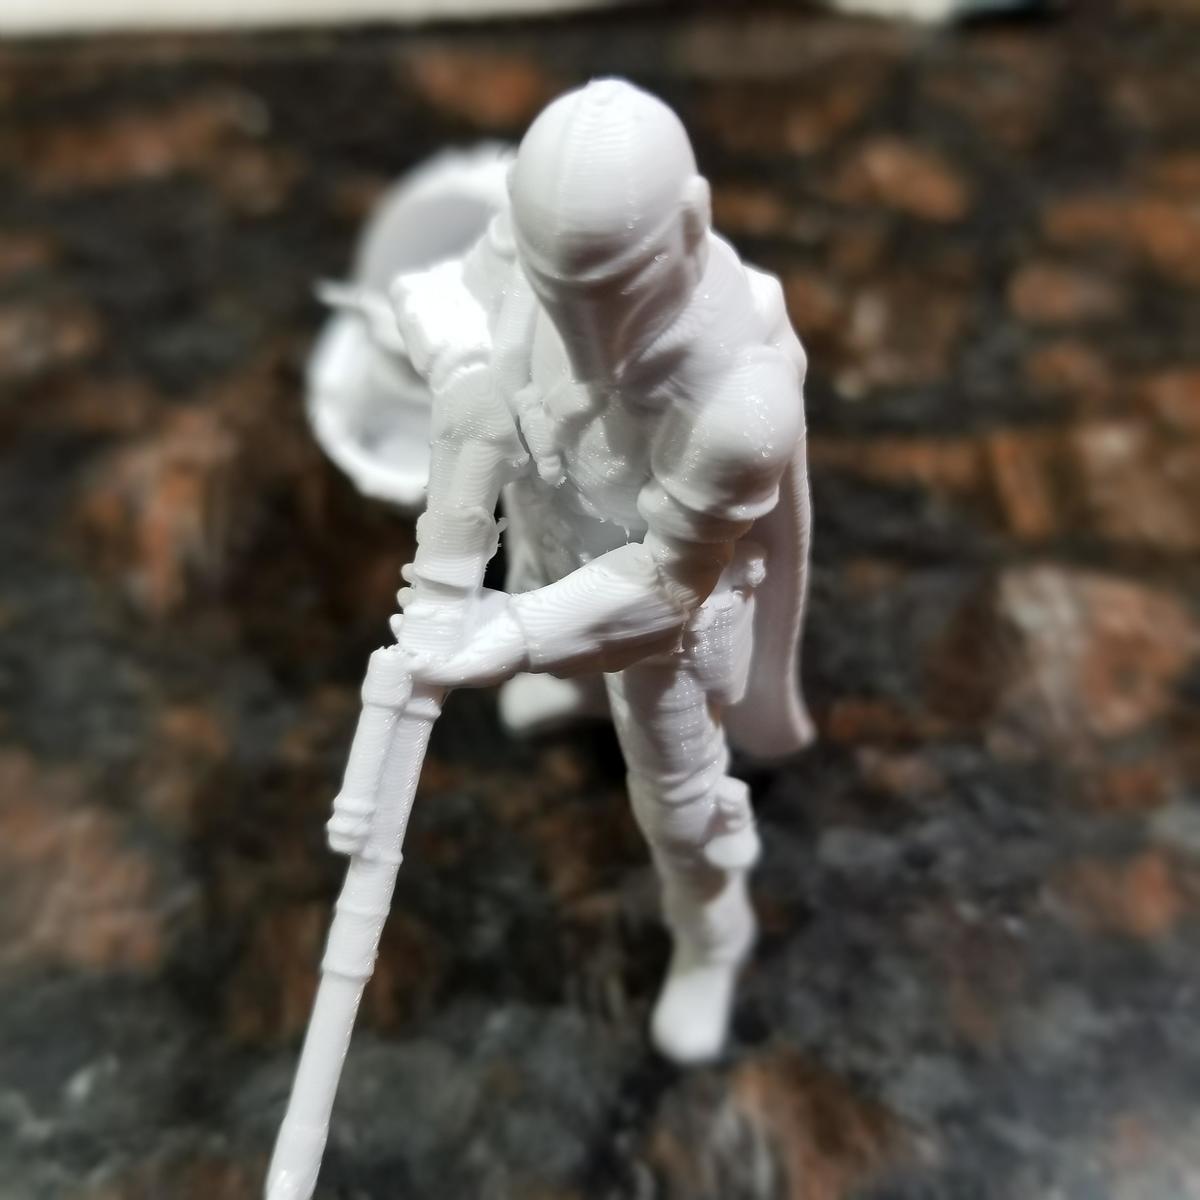 Figurine 3D printed using FDM method